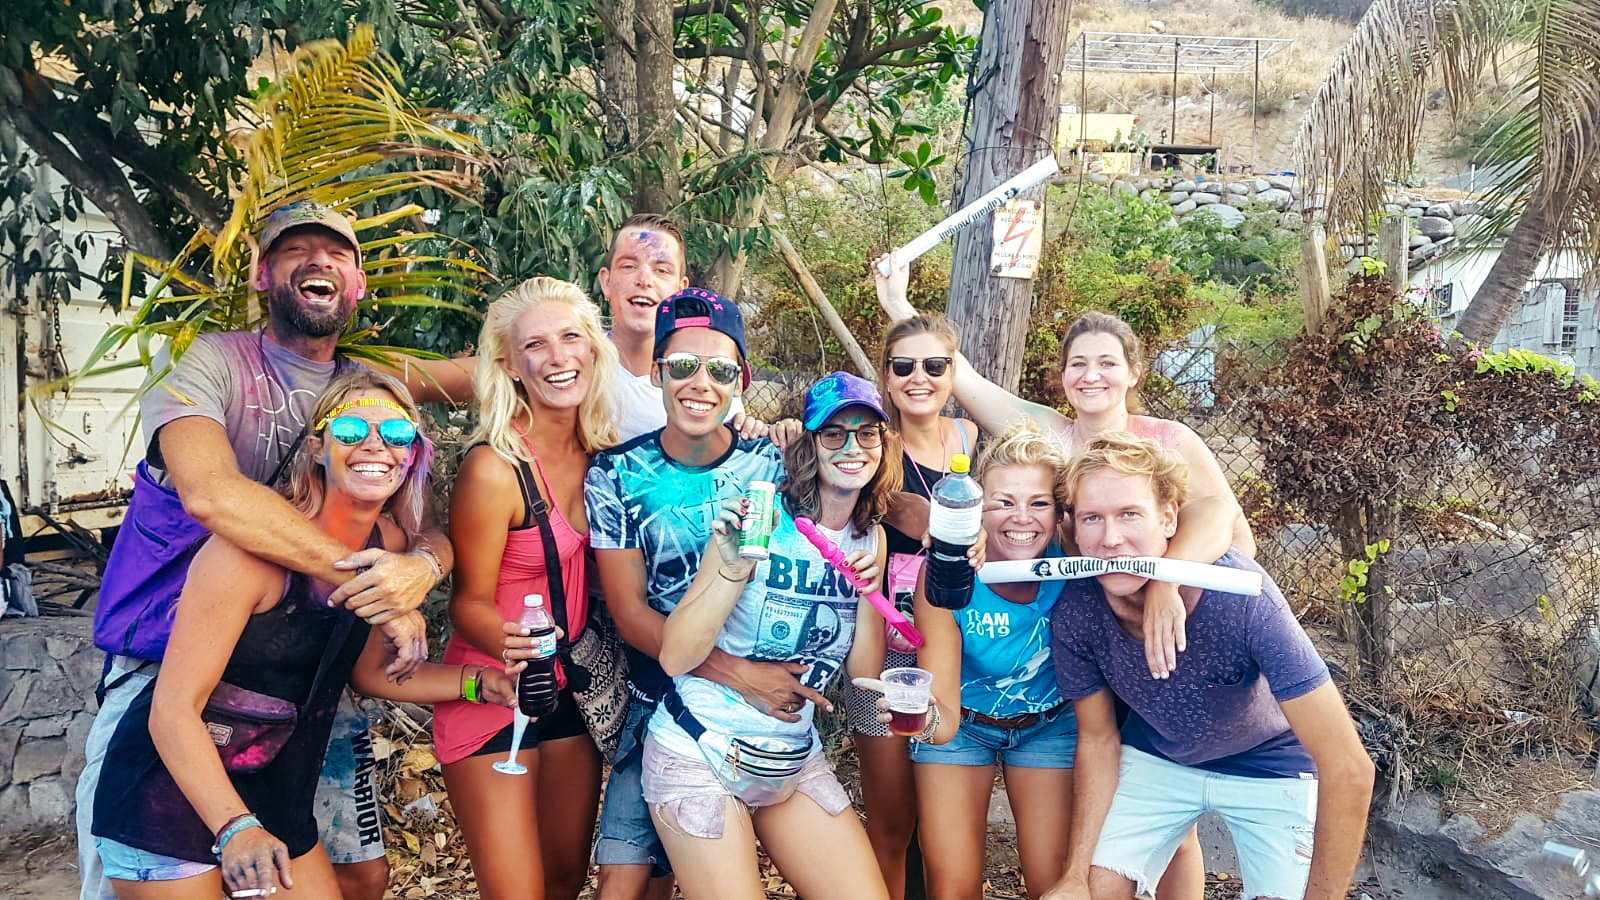 A group of friends splattered in paint having a fun day on Sint Maarten island